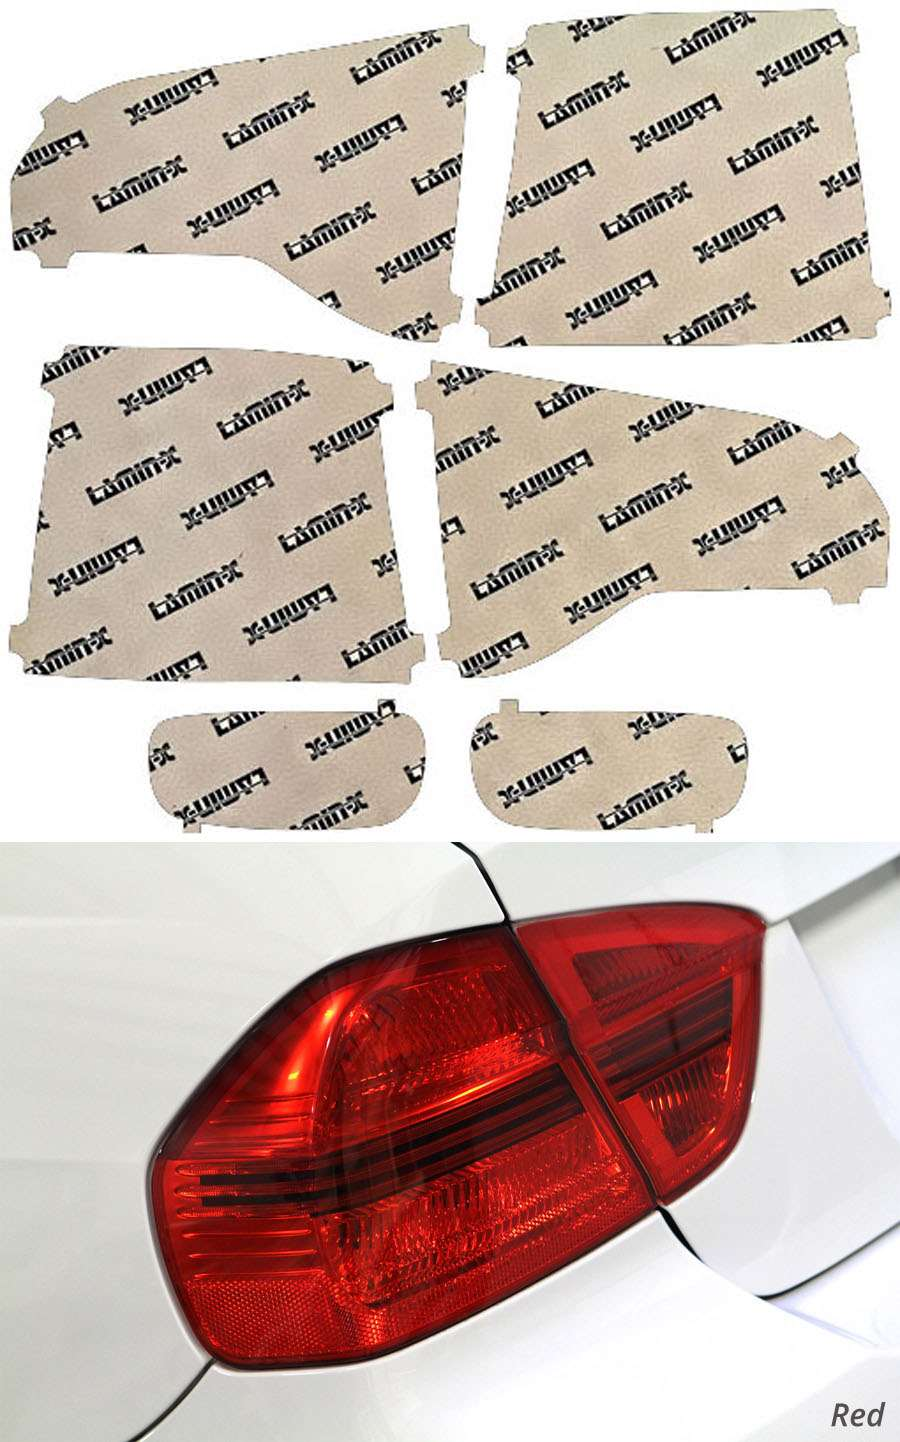 Kia Sorento 14-15 Red Tail Light Covers Lamin-X K226R